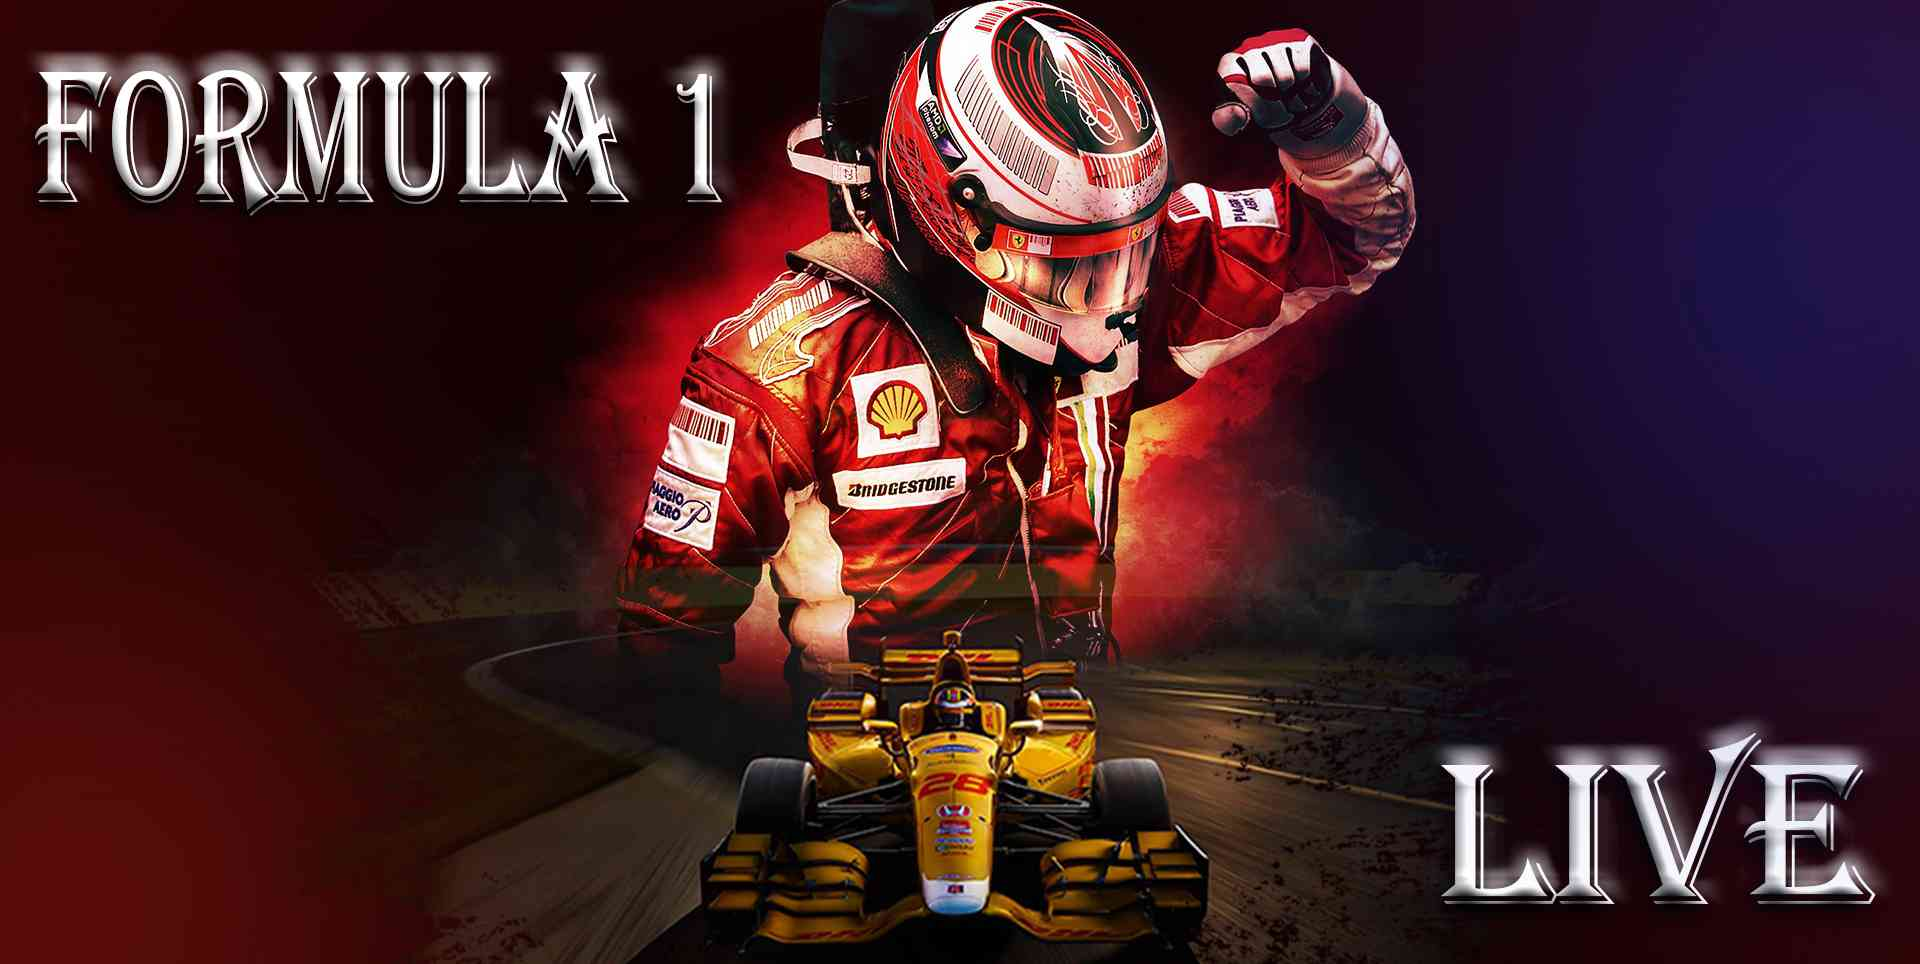 live-2014-formula-1-australian-grand-prix-online